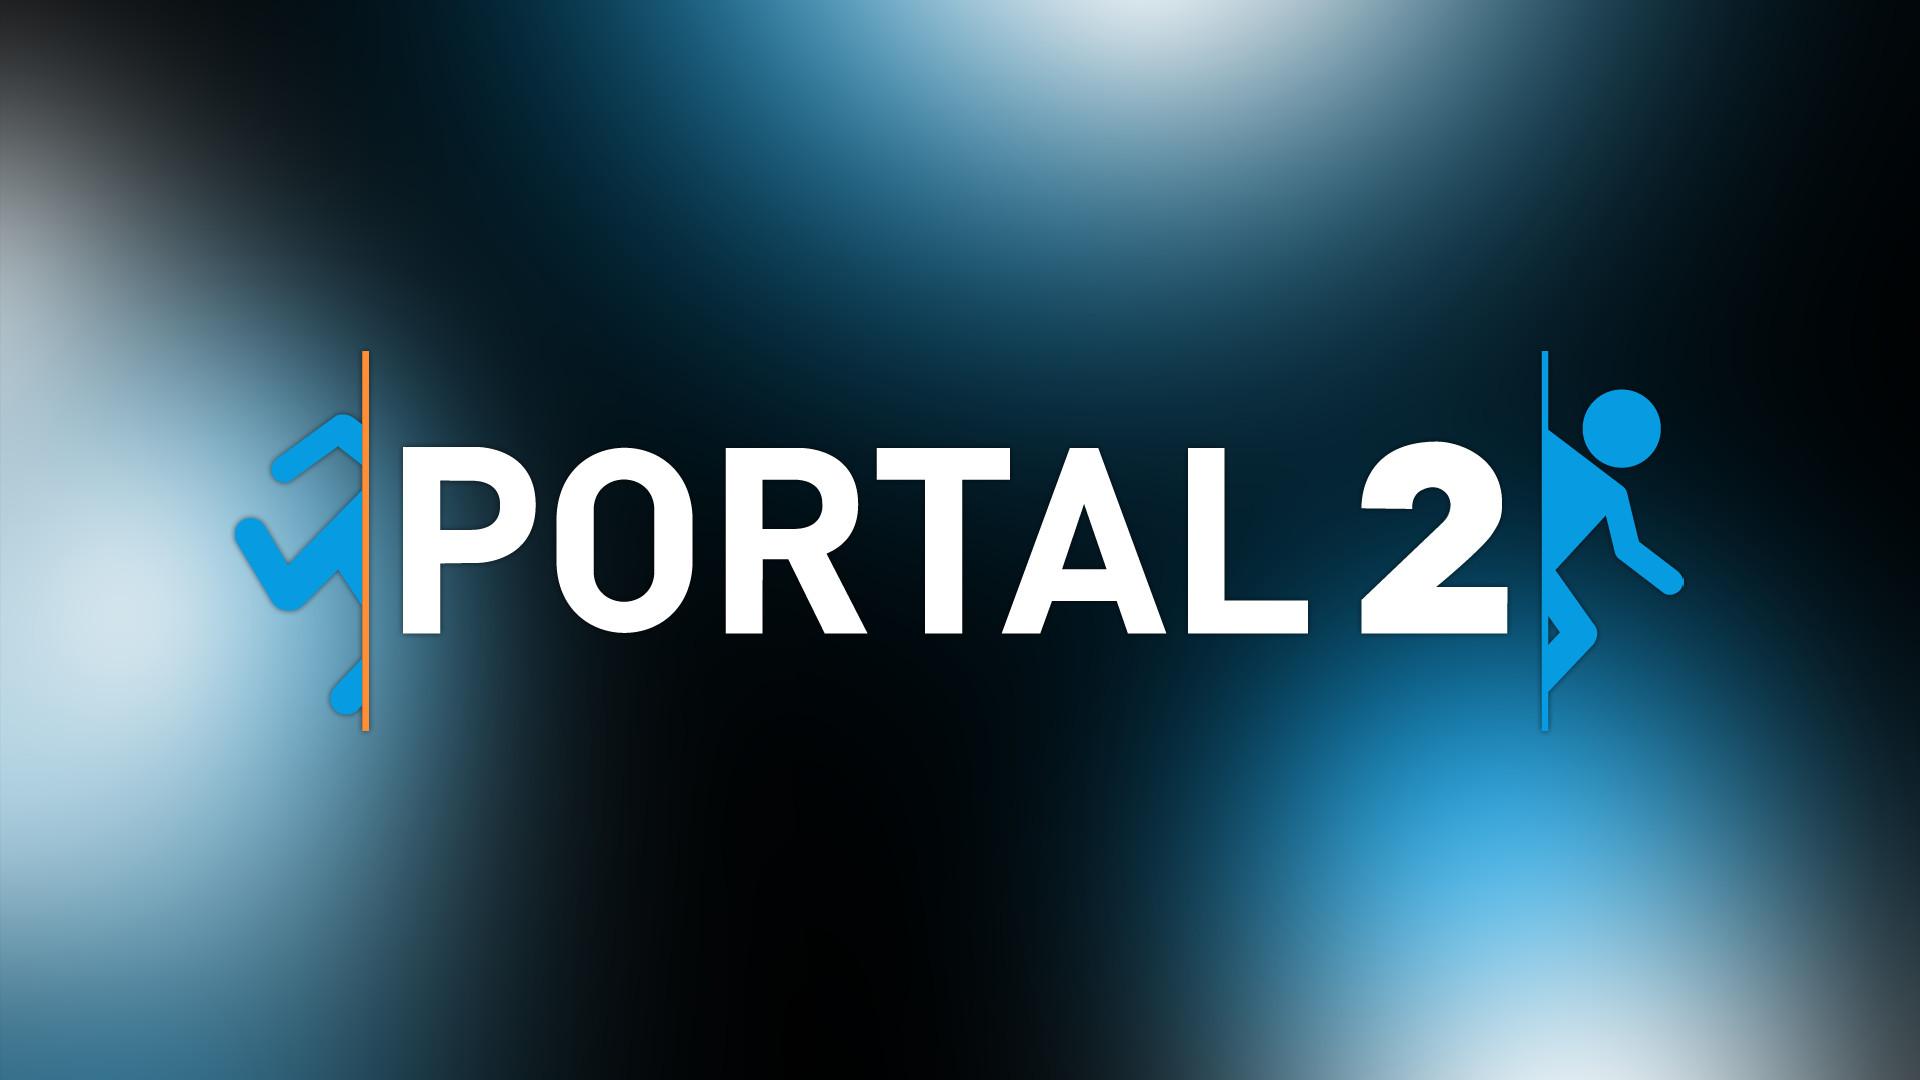 Portal 2 HD Wallpaper in Full HD from the Portal category.